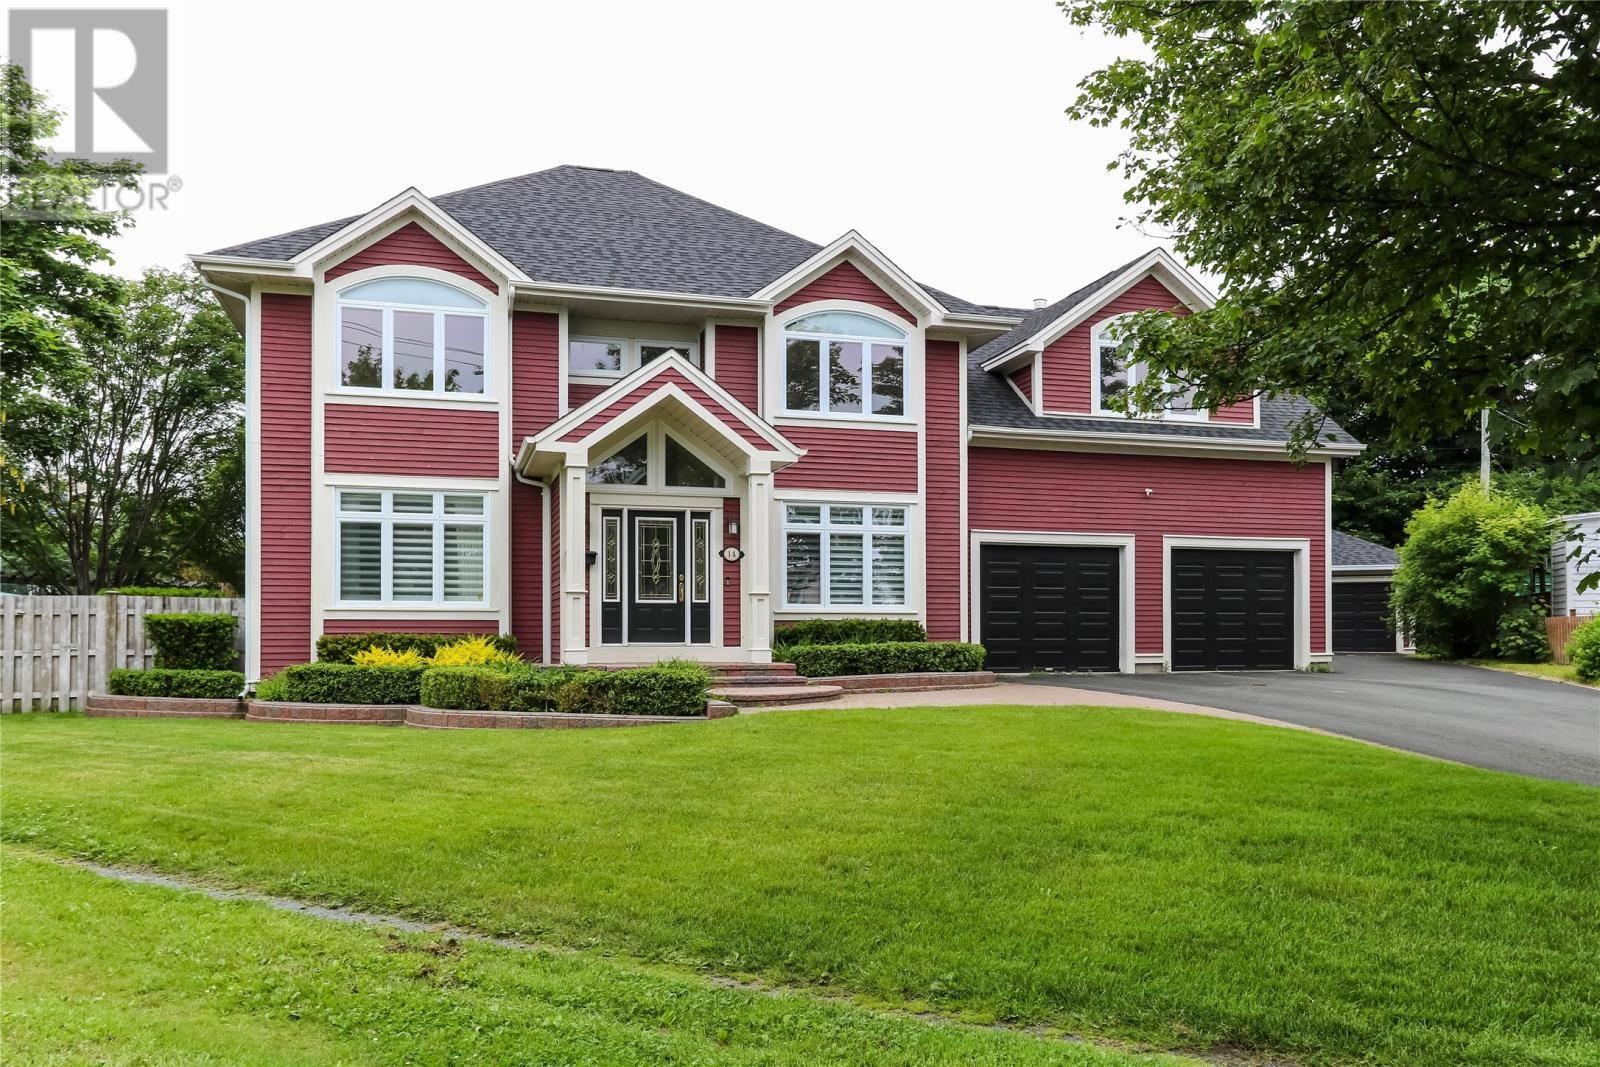 House for sale at 14 Kent Pl St. John's Newfoundland - MLS: 1199962